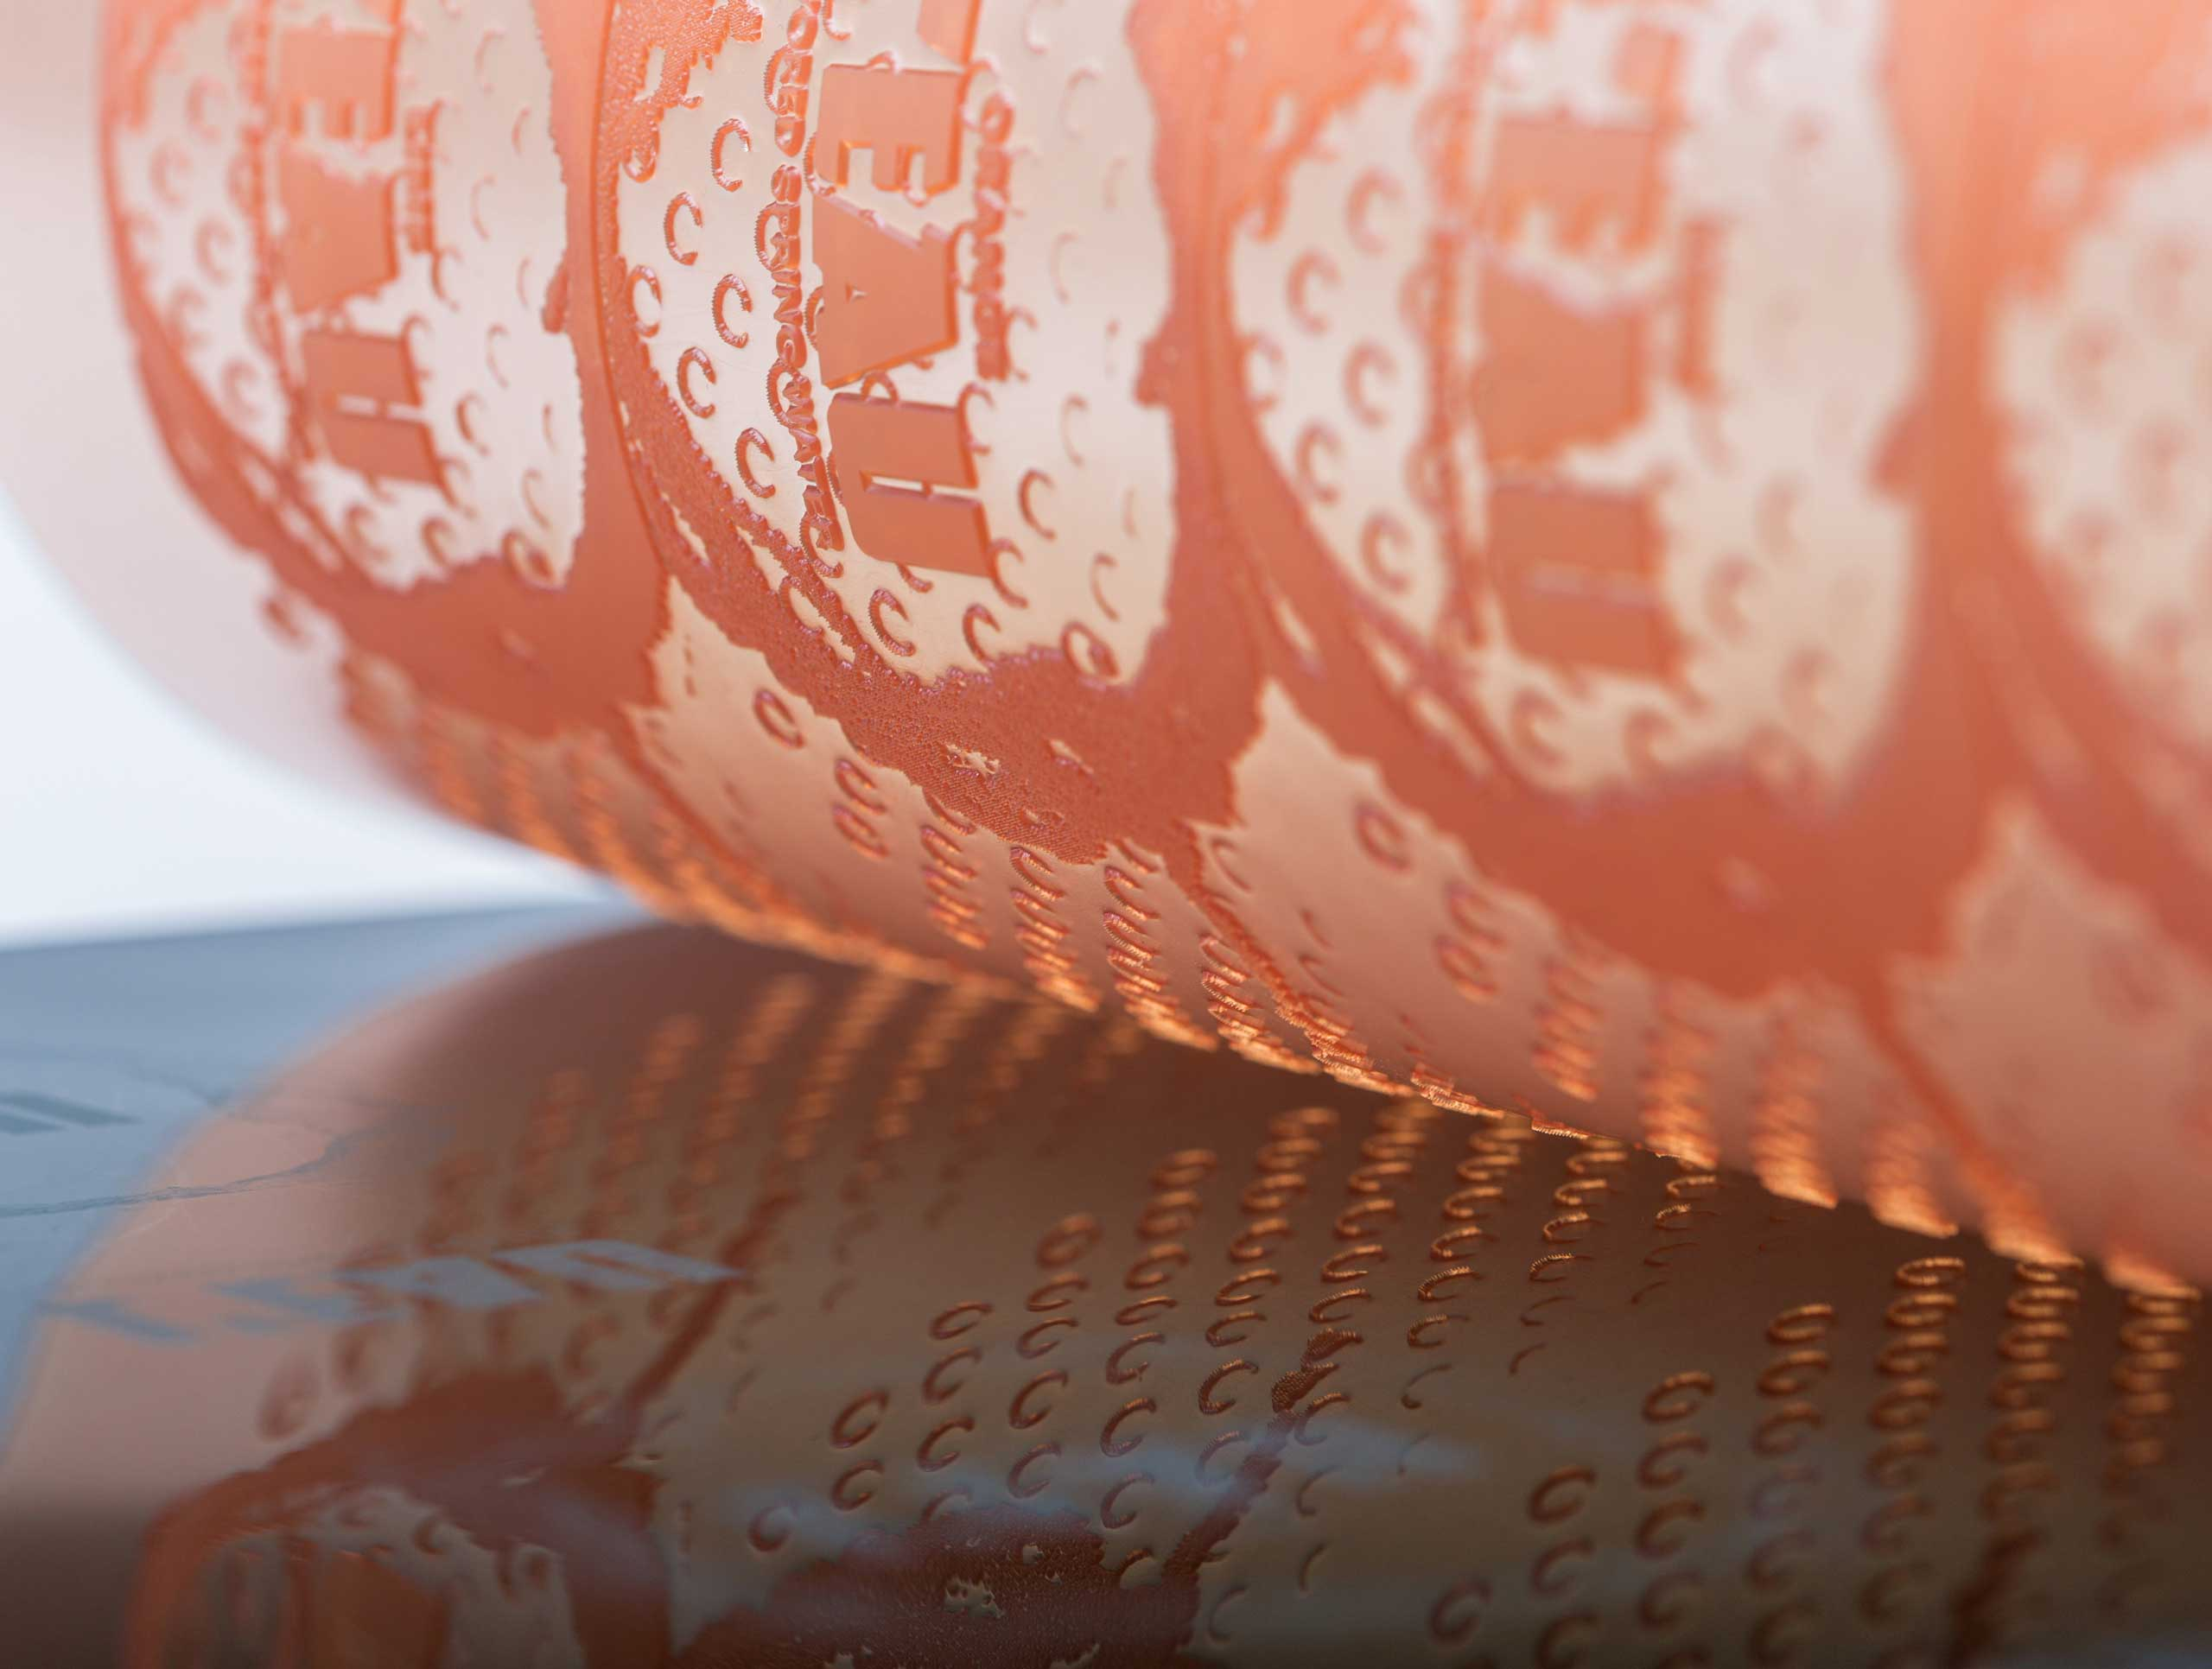 Köstlin Prepress Services | Printing forme production: flexographic printing clichés